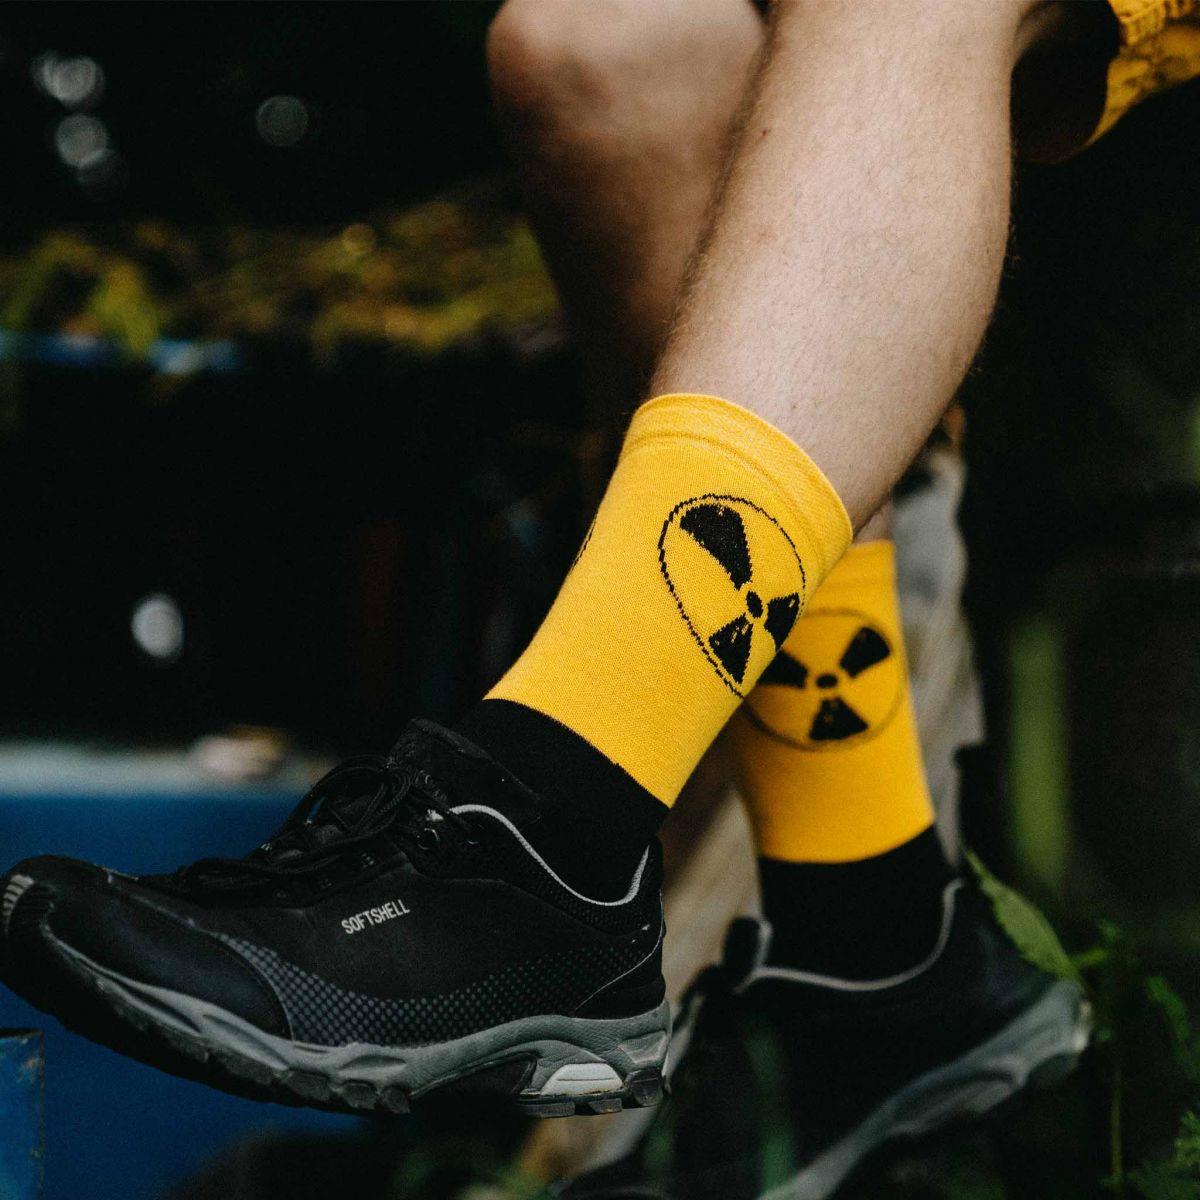 Socken - Strahlung p3